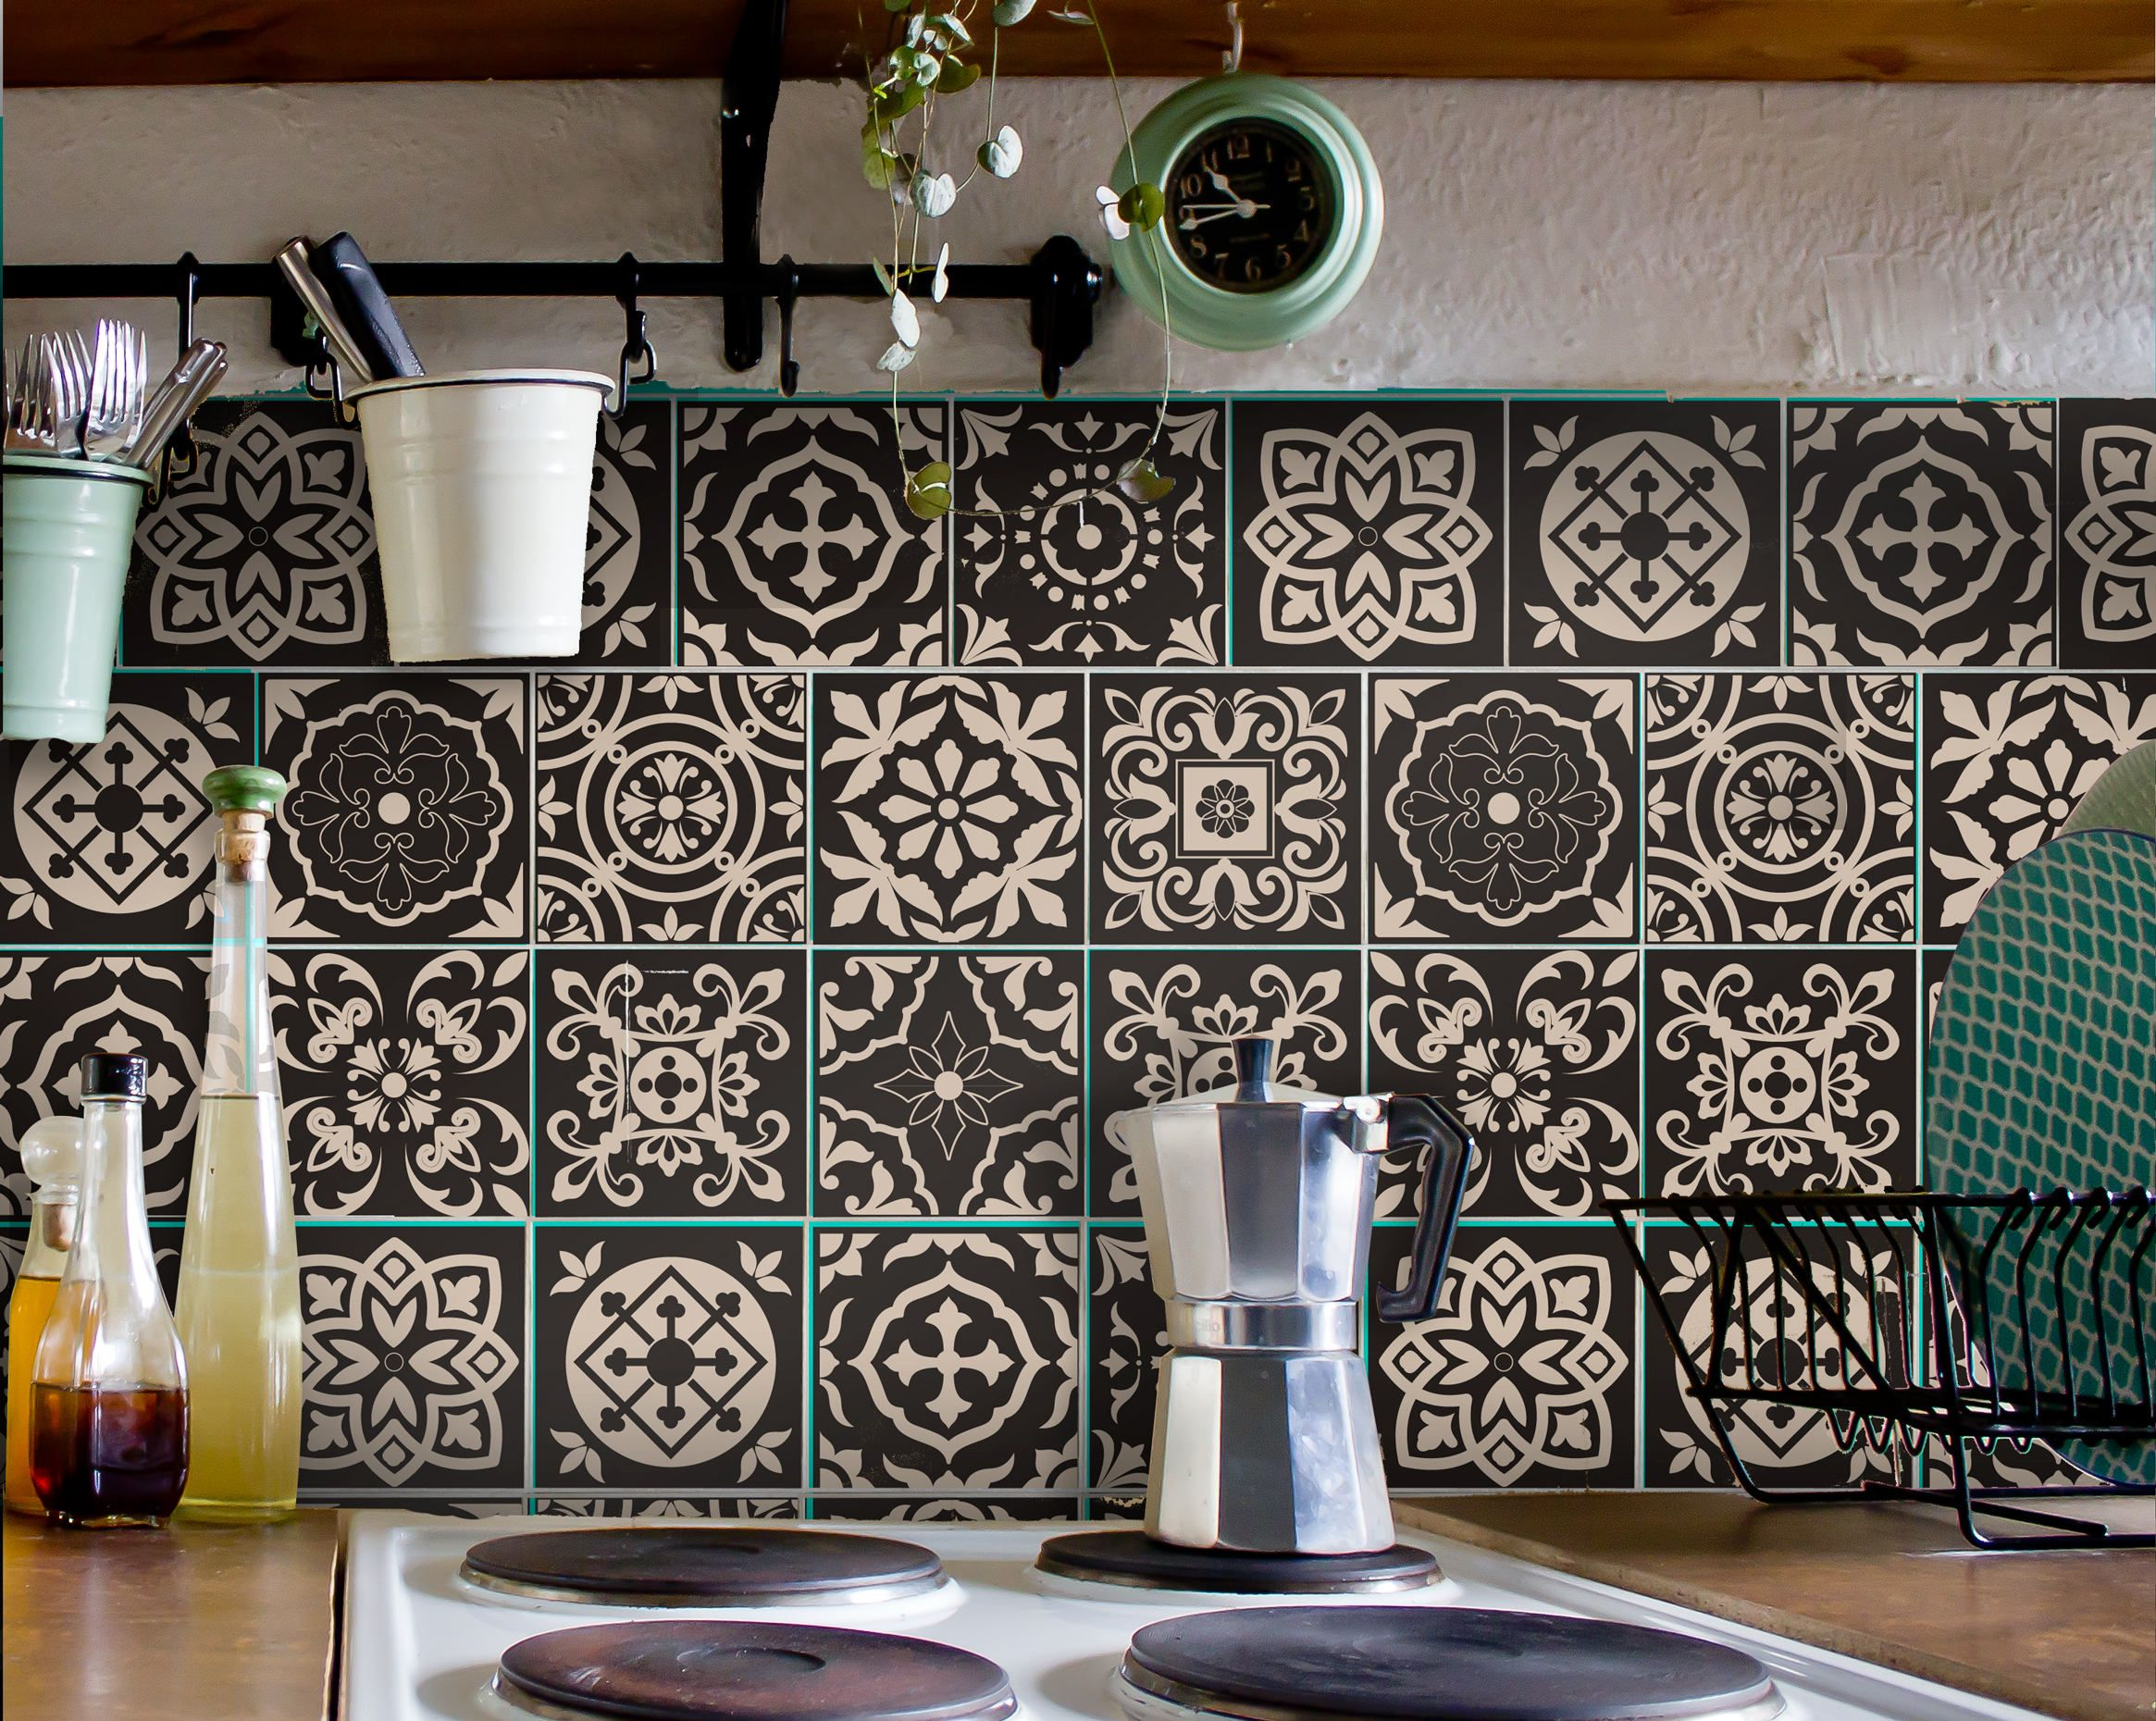 Fliesenfolie Küche fliesenaufkleber portugiesisch set 12 stk 15x15cm flooring ideas